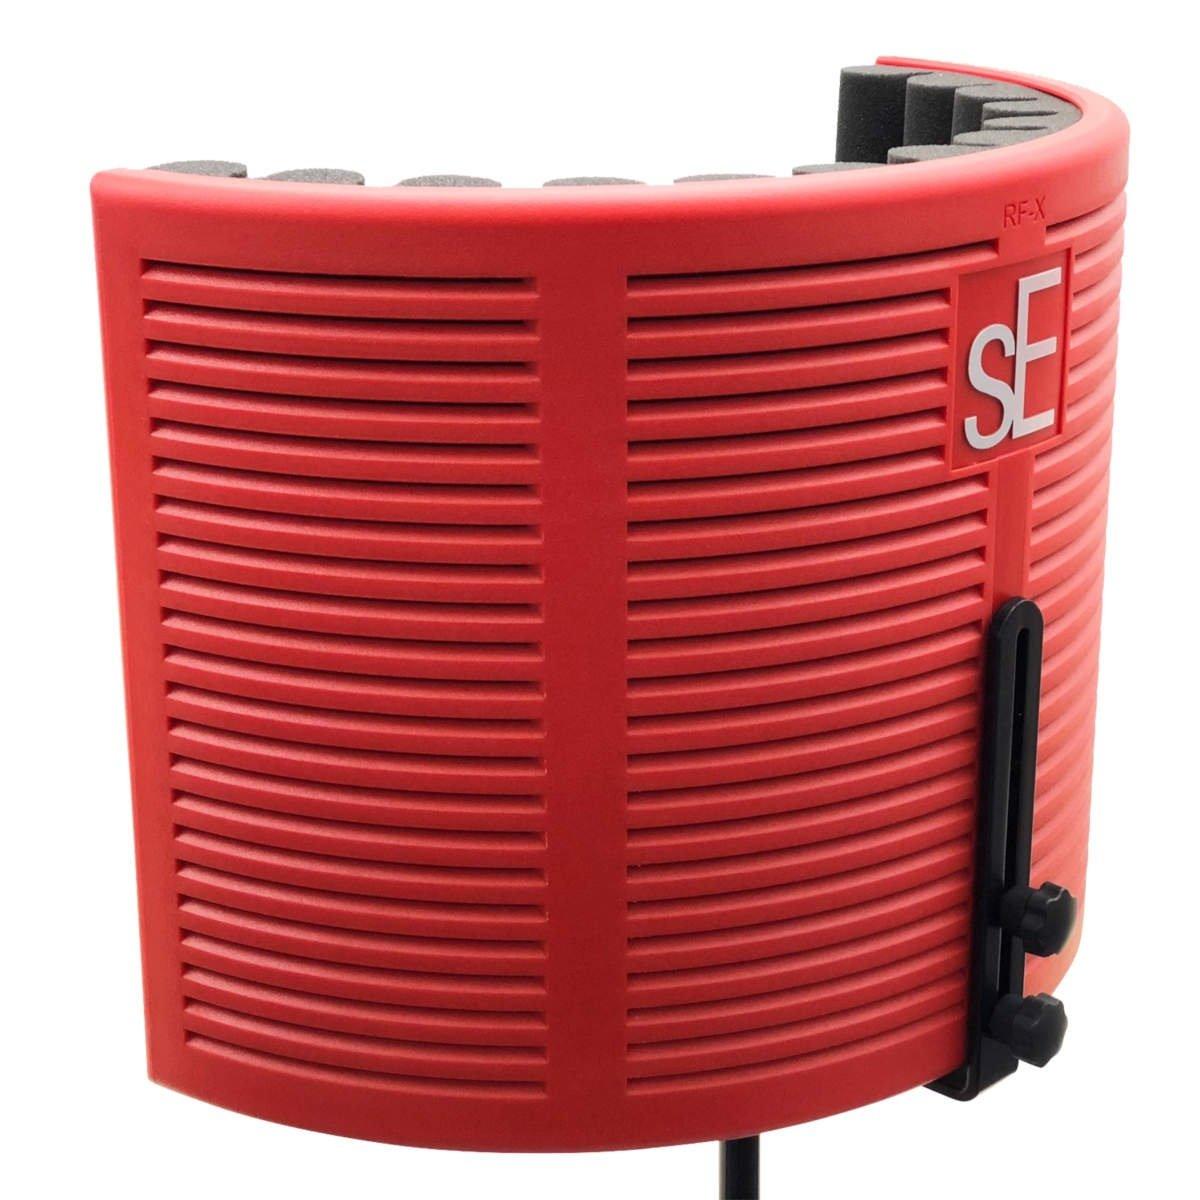 sE Electronics RF-X Reflexion Filter Portable Acoustic Treatment Device - Red-Black Color Version